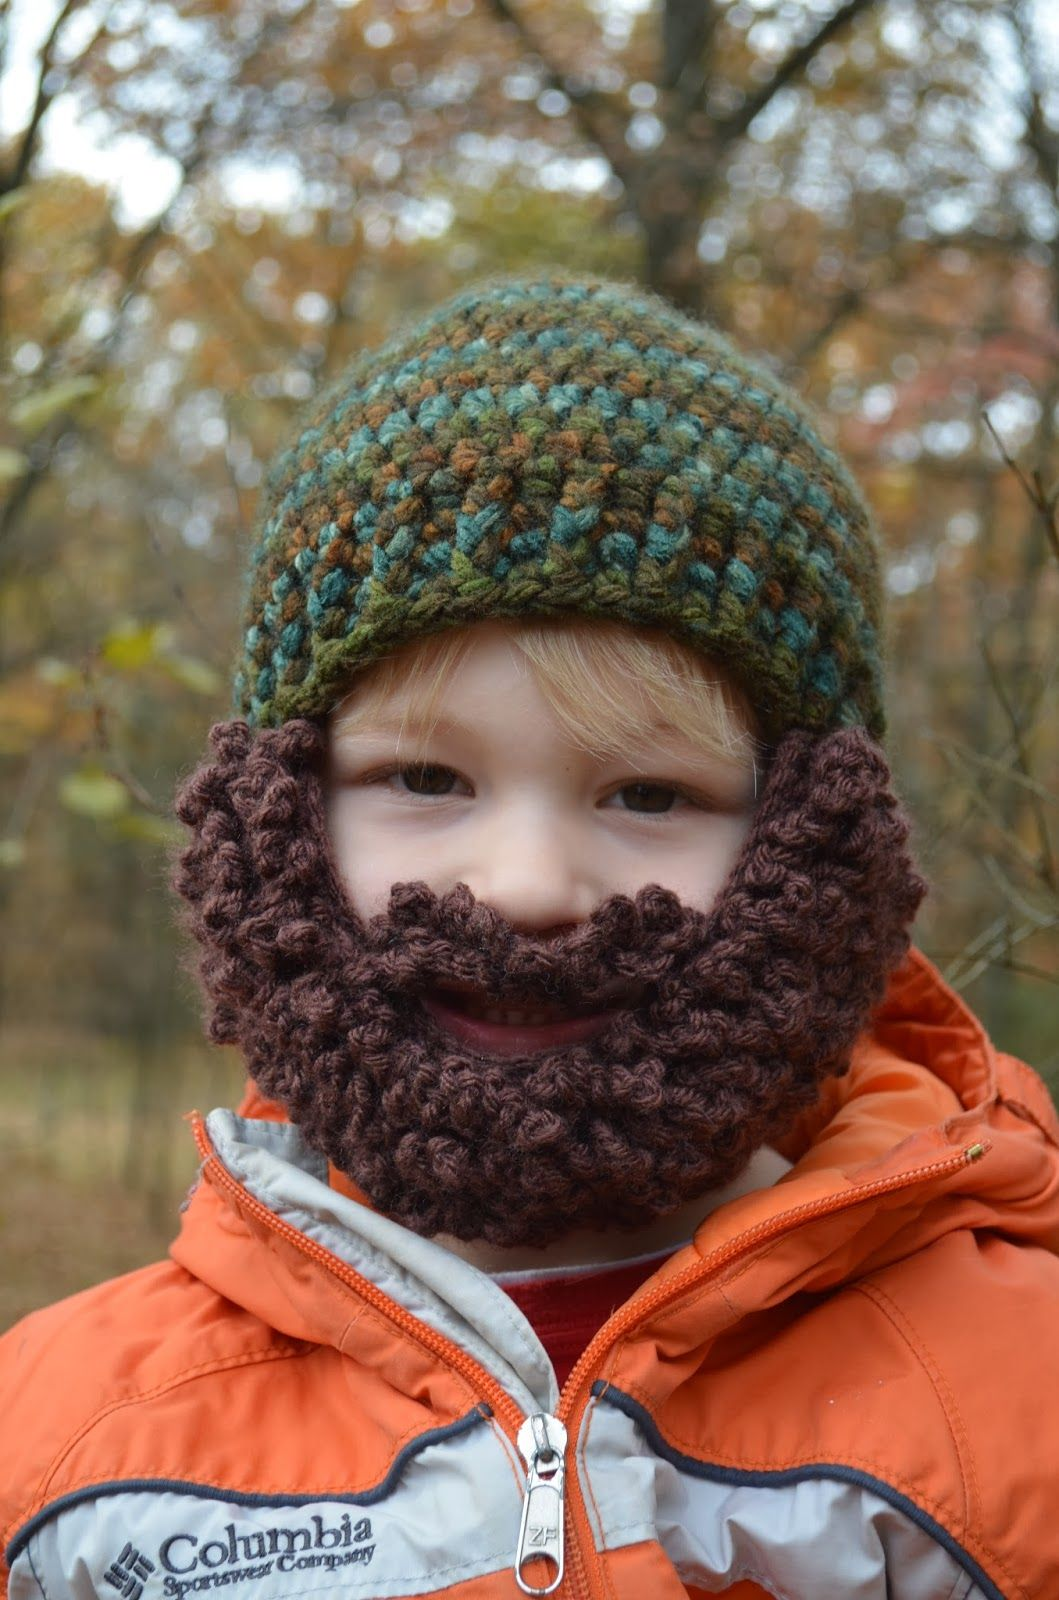 Hand Me Down Hobby: Mountain Man Beard Hat   Crochet hat patterns ...